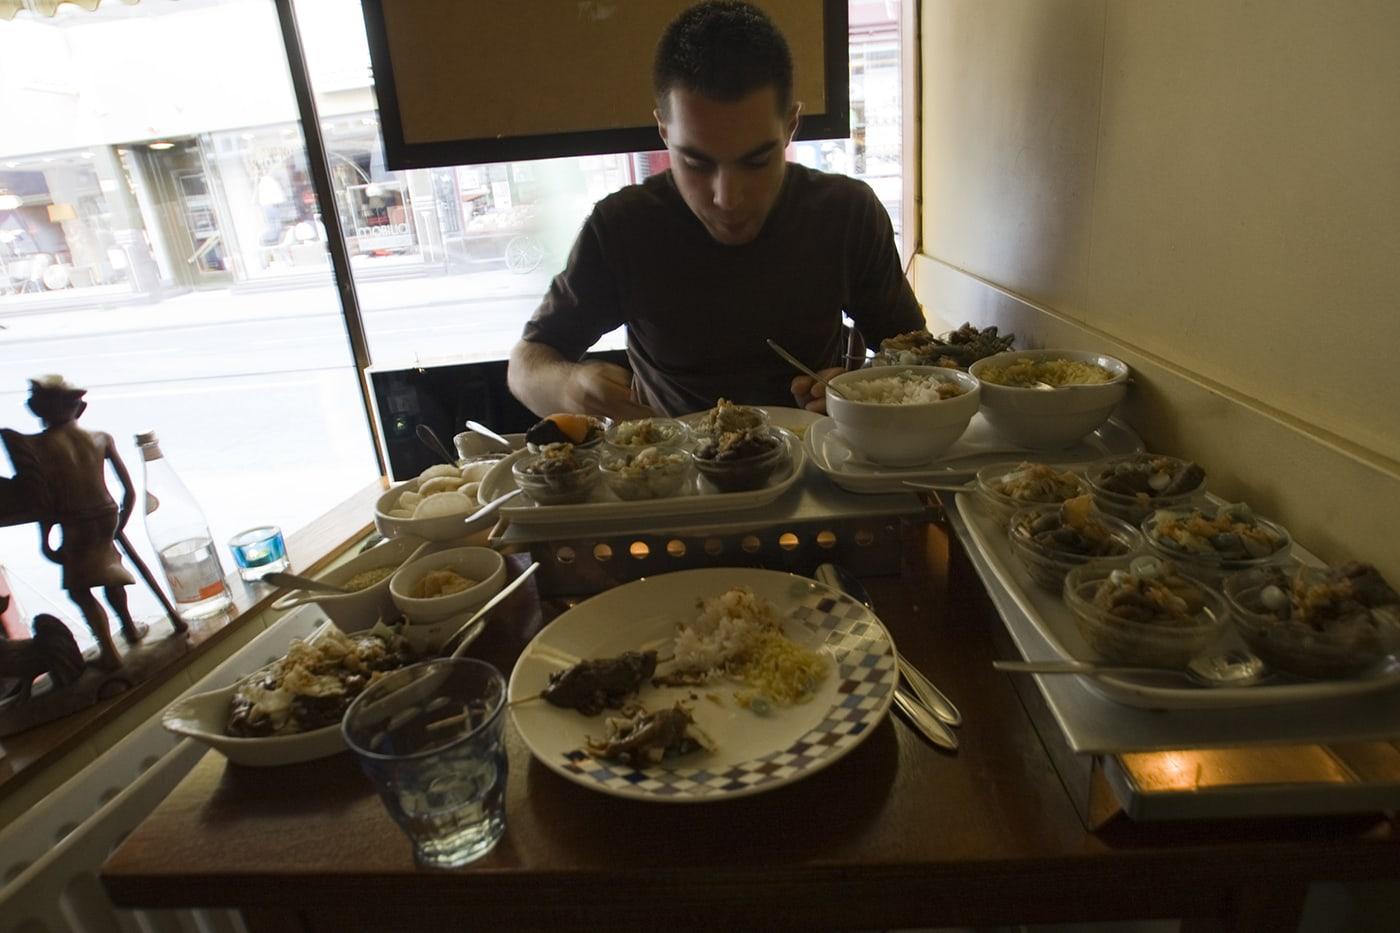 Rijsttafel Indonesian meal in Amsterdam.